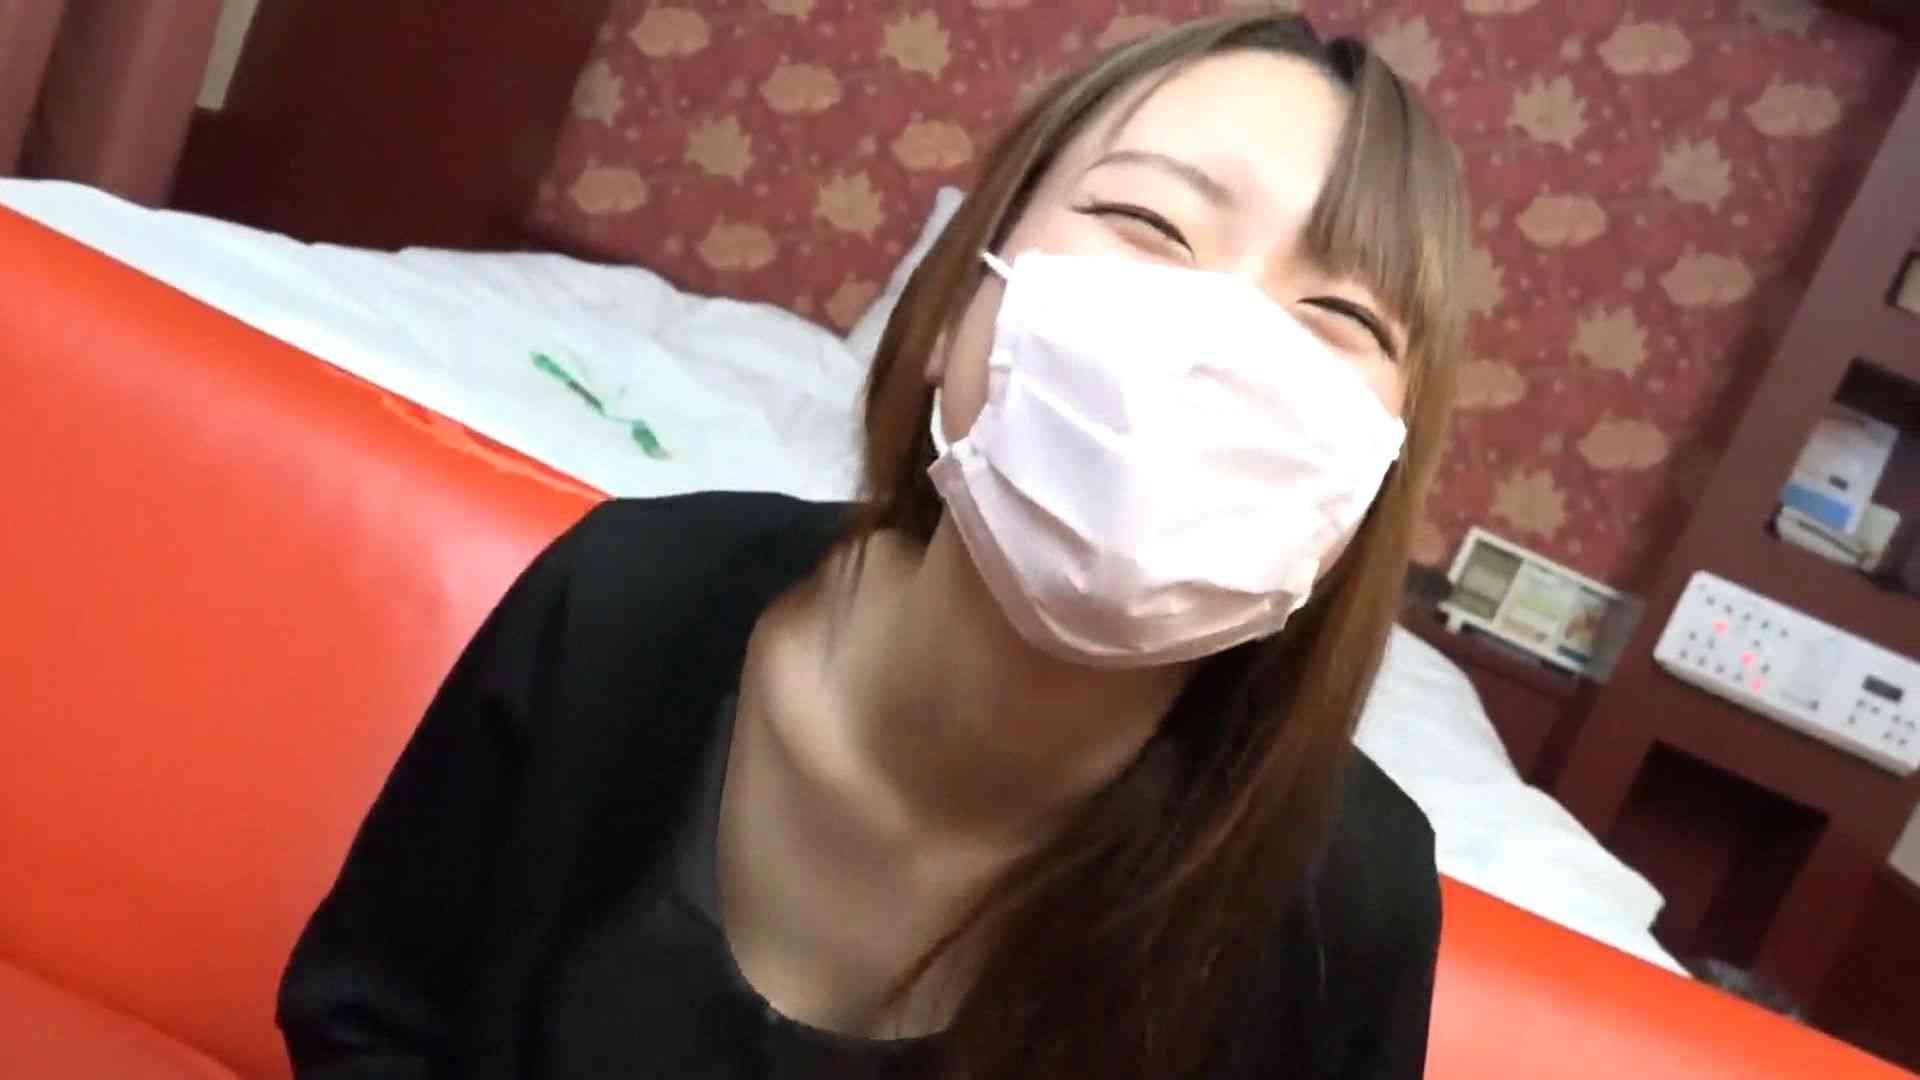 S級厳選美女ビッチガールVol.40 前編 美女 エロ無料画像 50連発 3